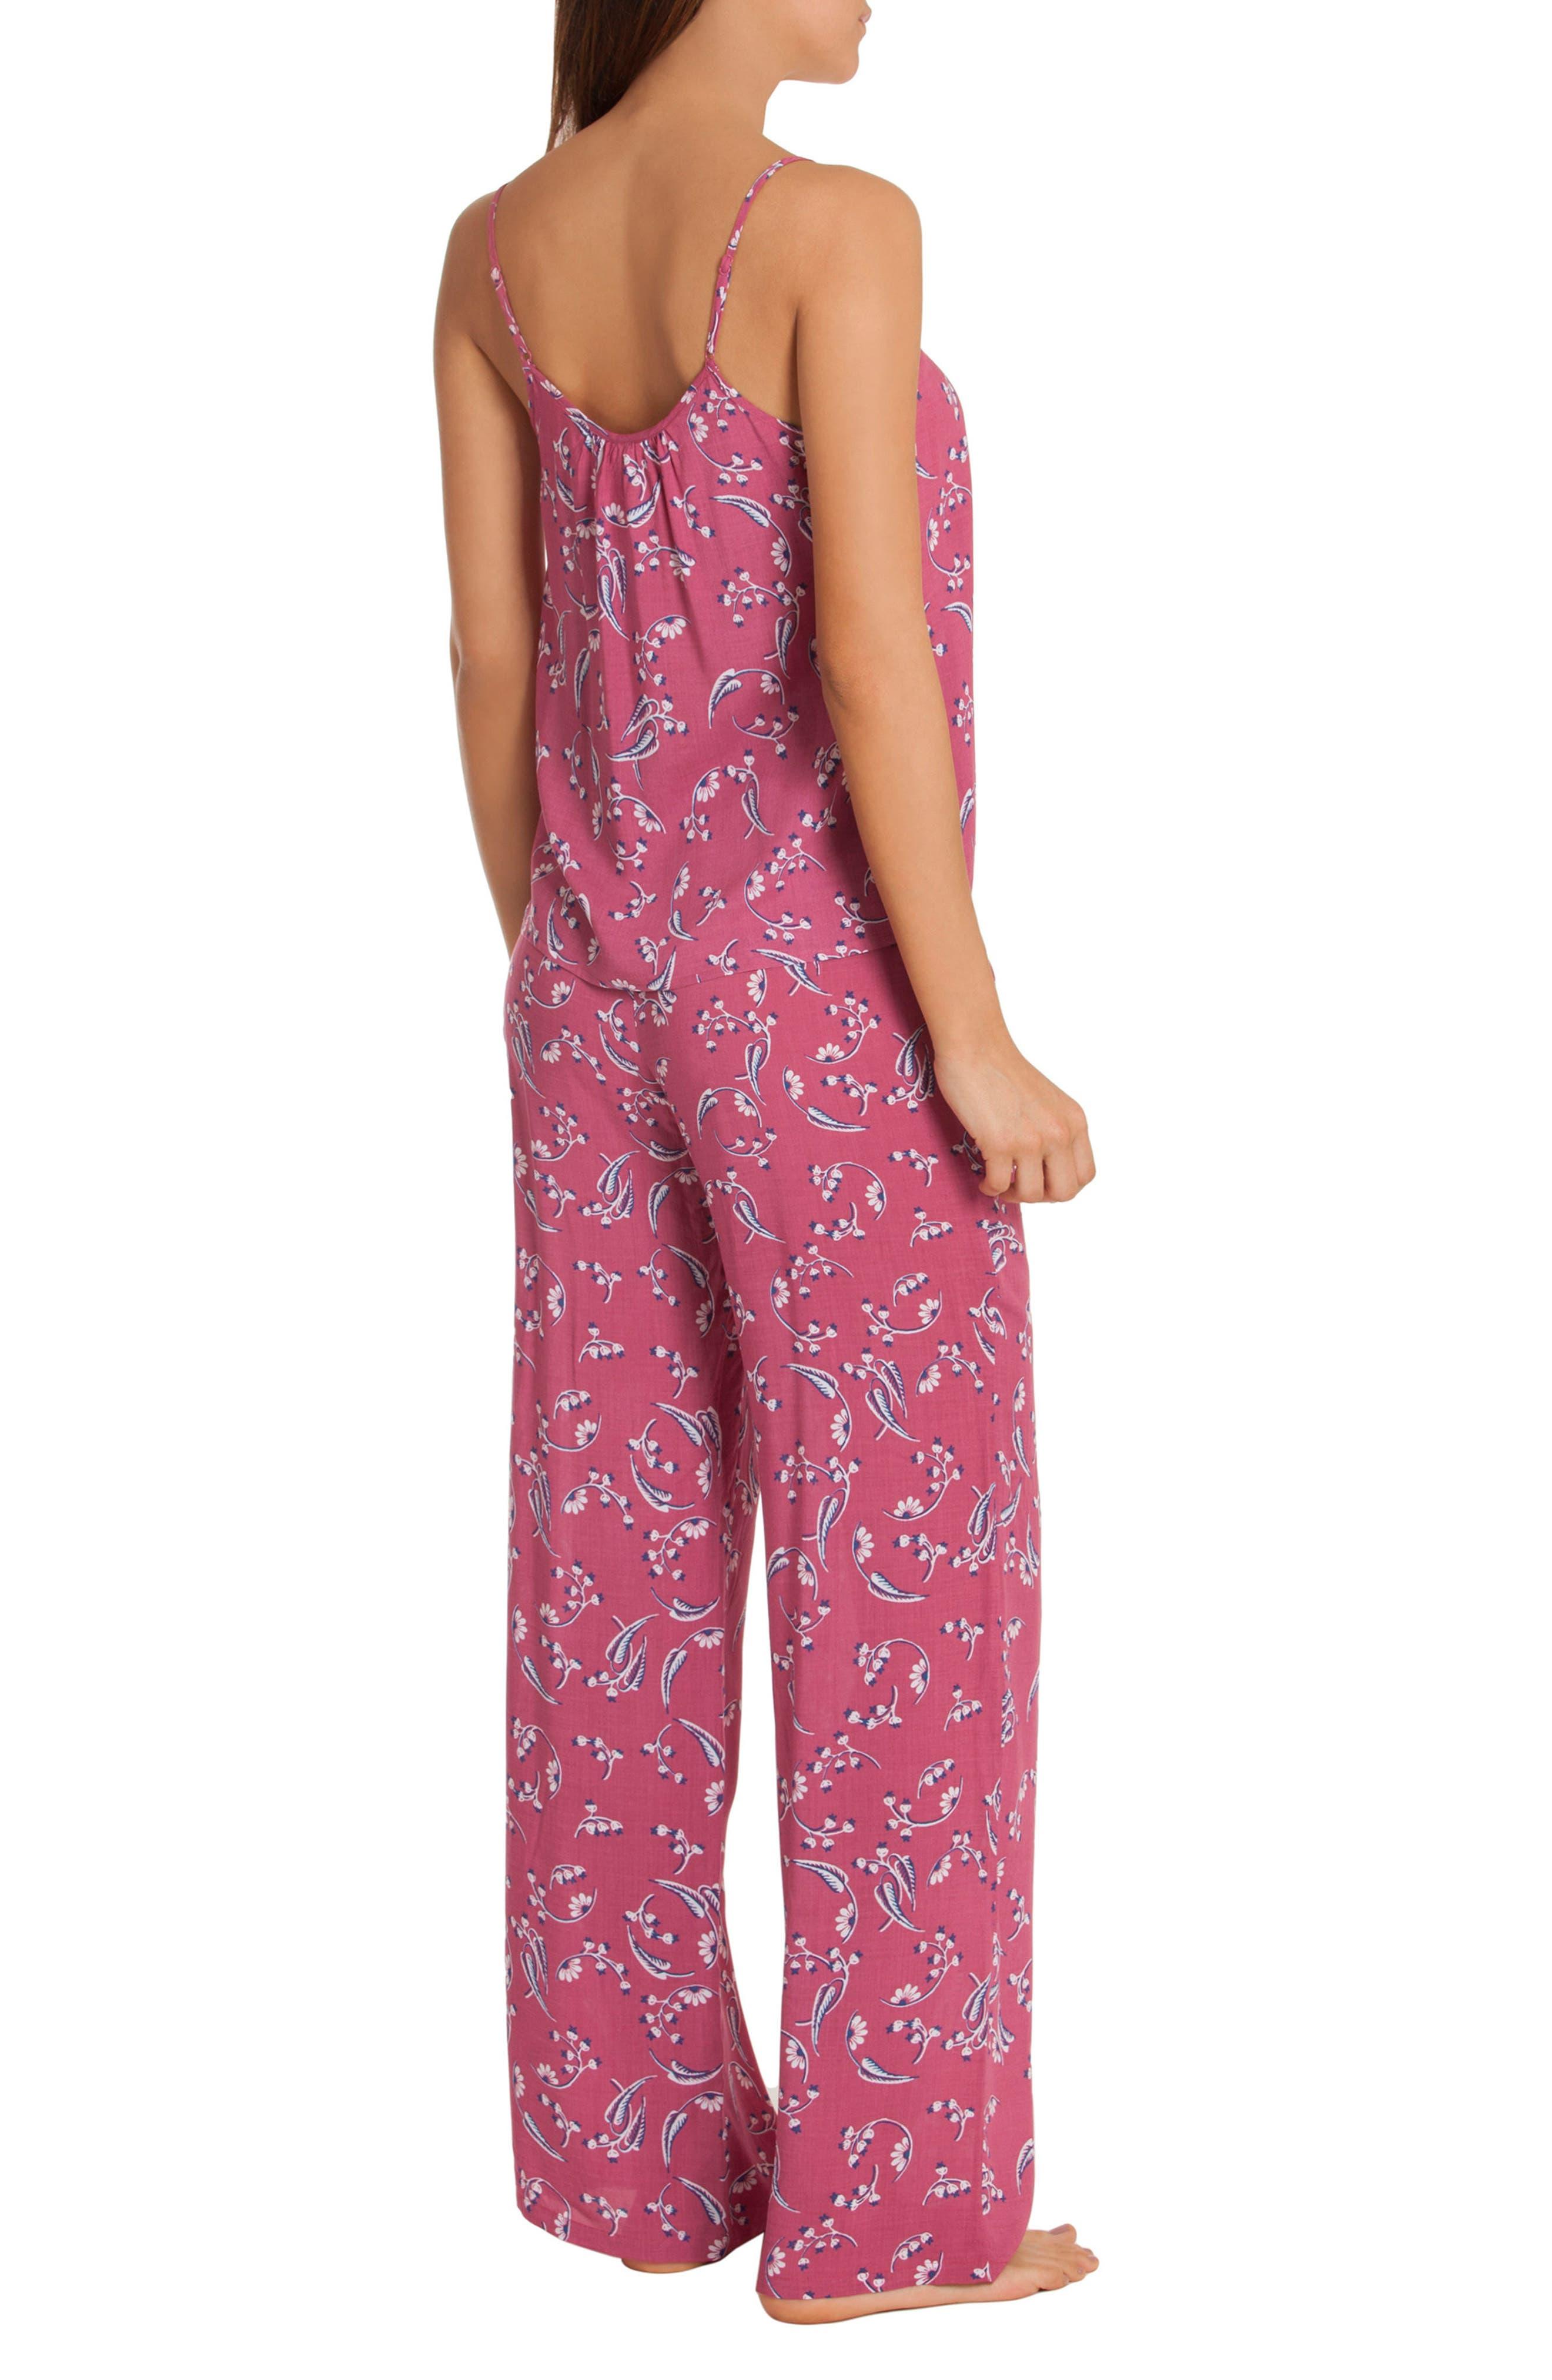 Floral Pajamas,                             Alternate thumbnail 2, color,                             651